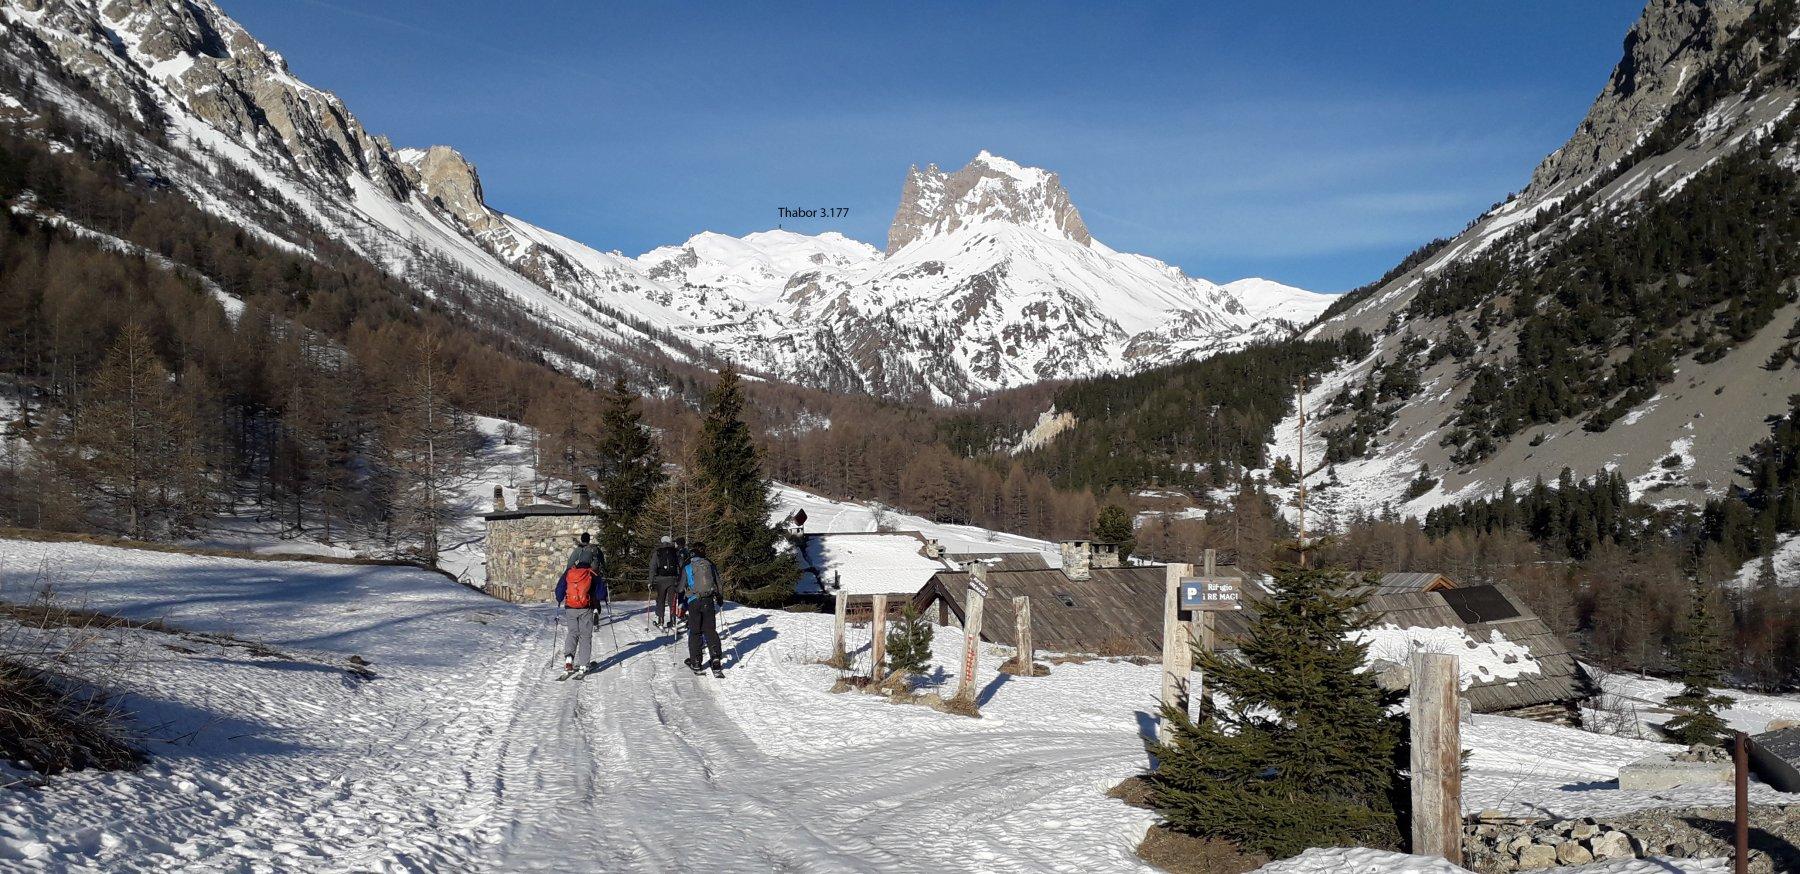 Dal 3° Alpini la meta è ancora lontana